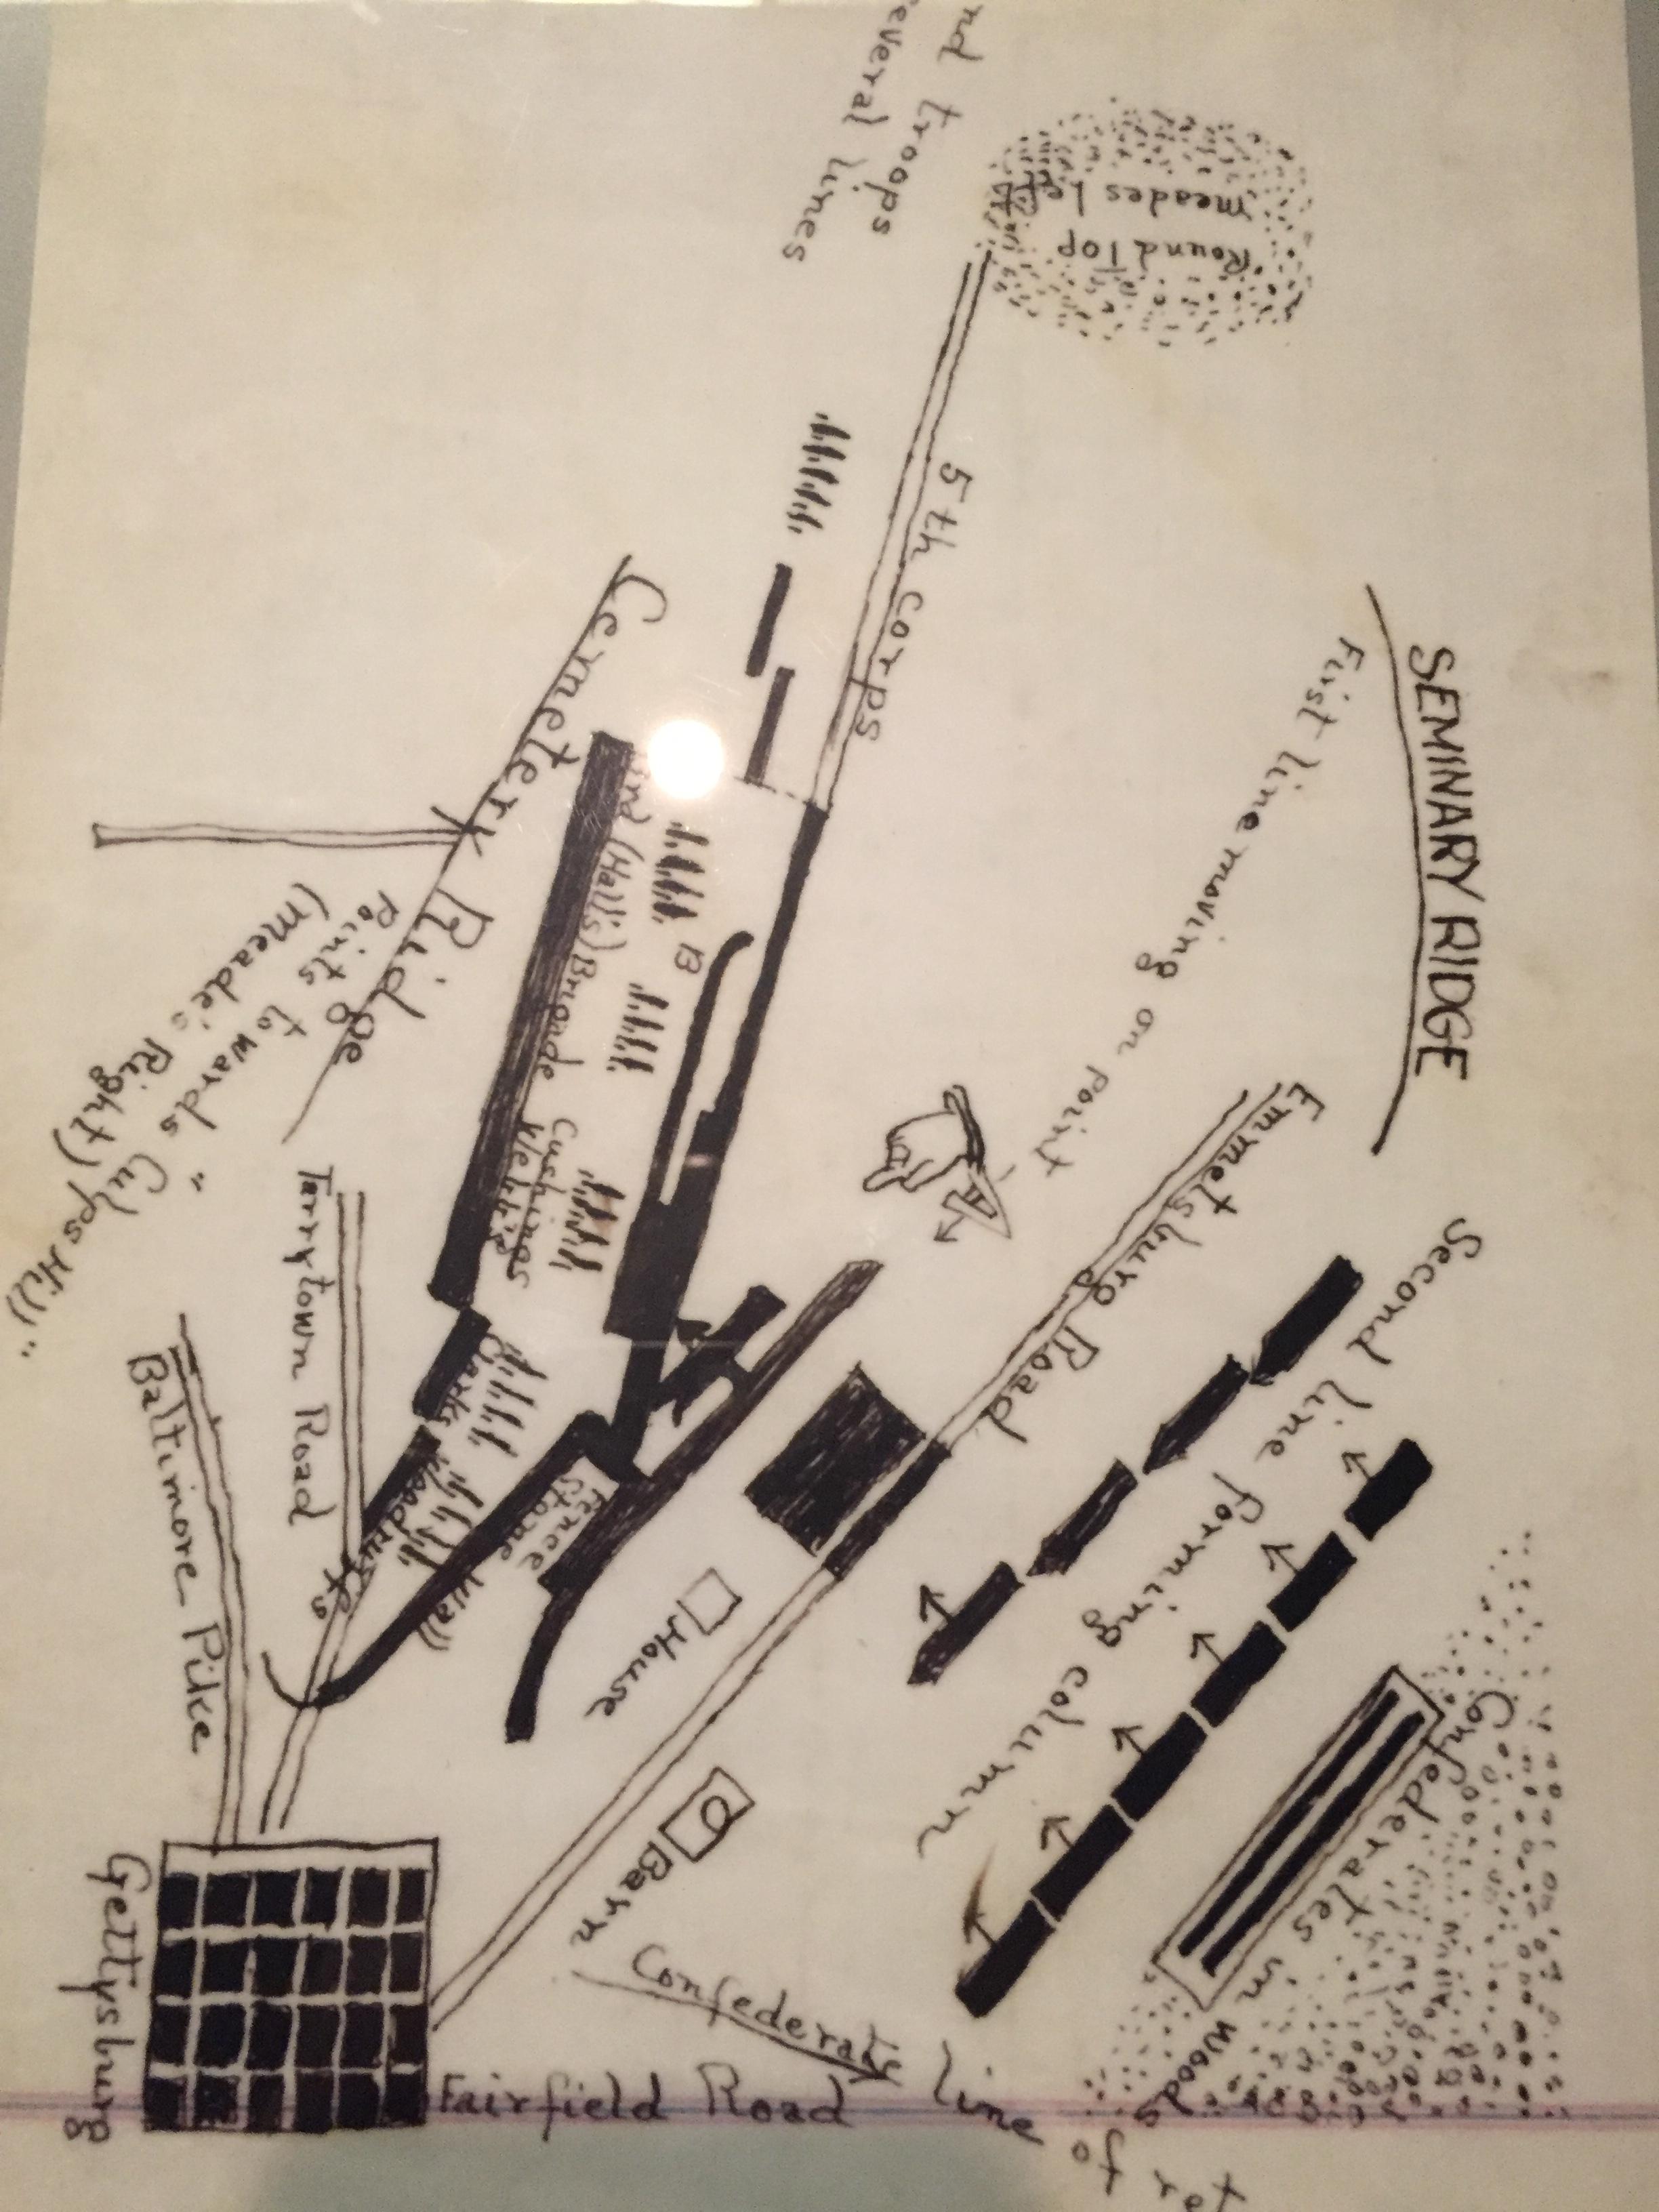 Hand drawn map by George Pickett of third day's battle at Gettysburg